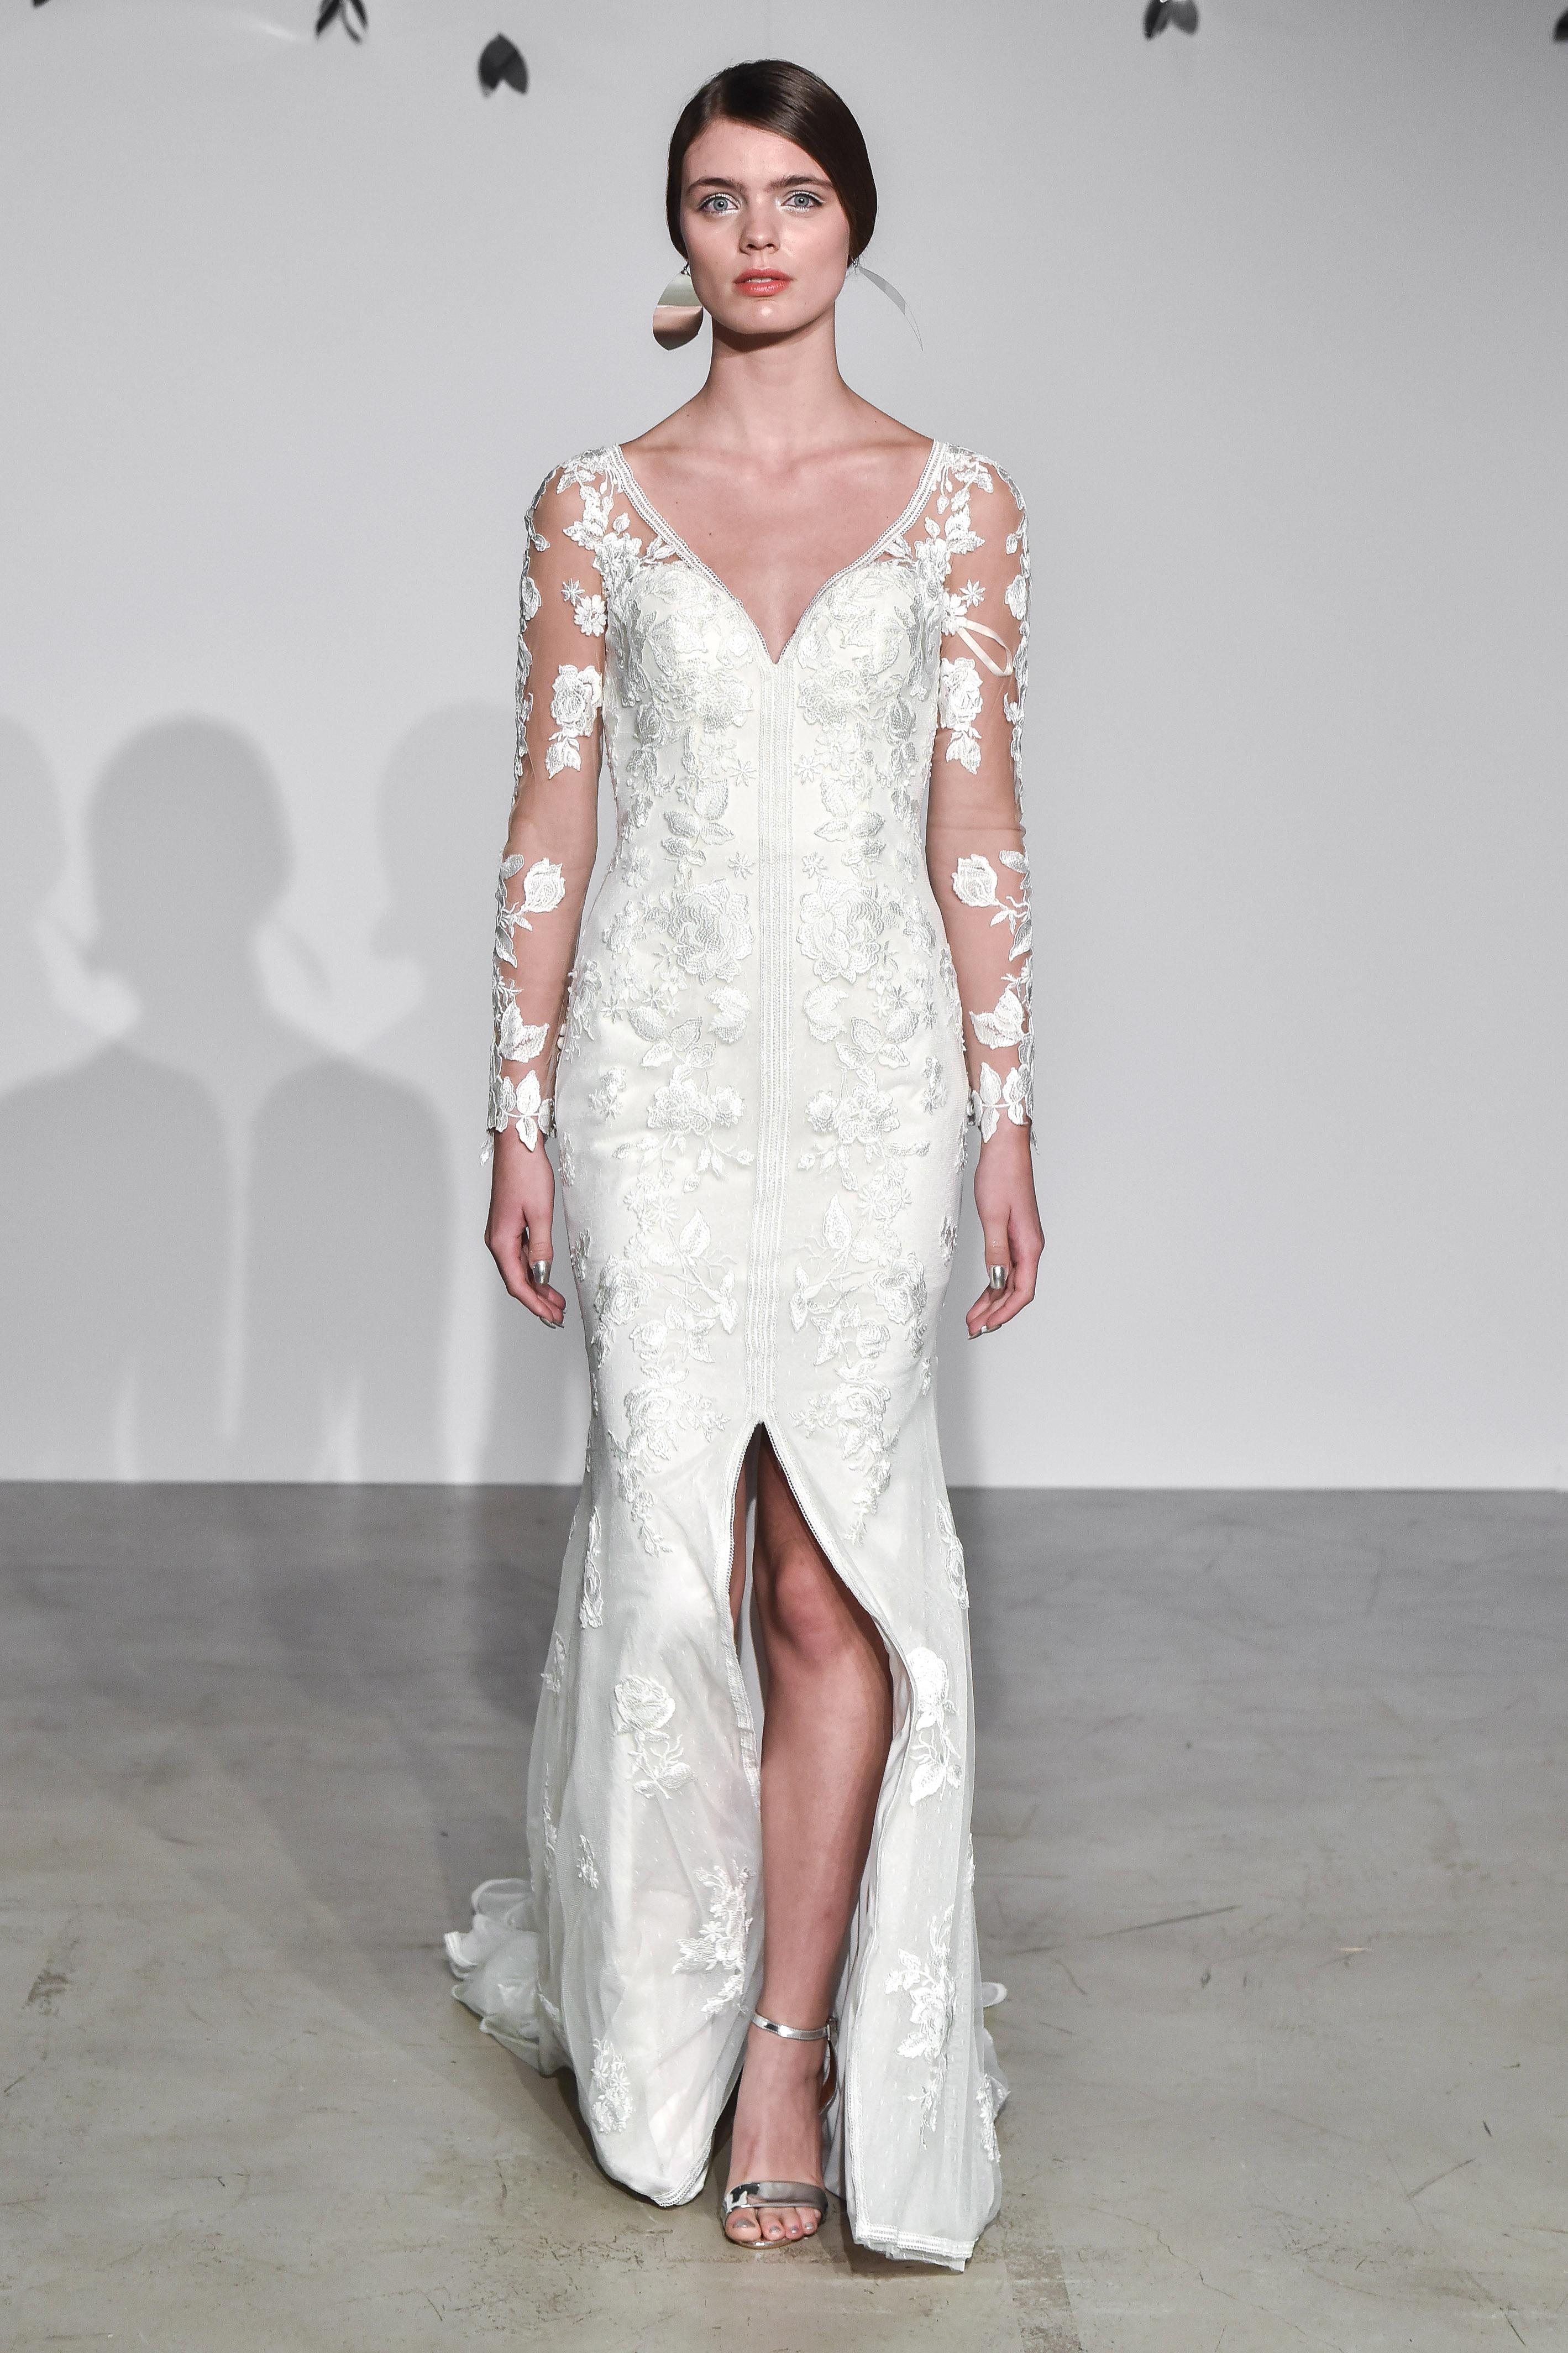 justin alexander fall 2018 v-neck long sleeve wedding dress